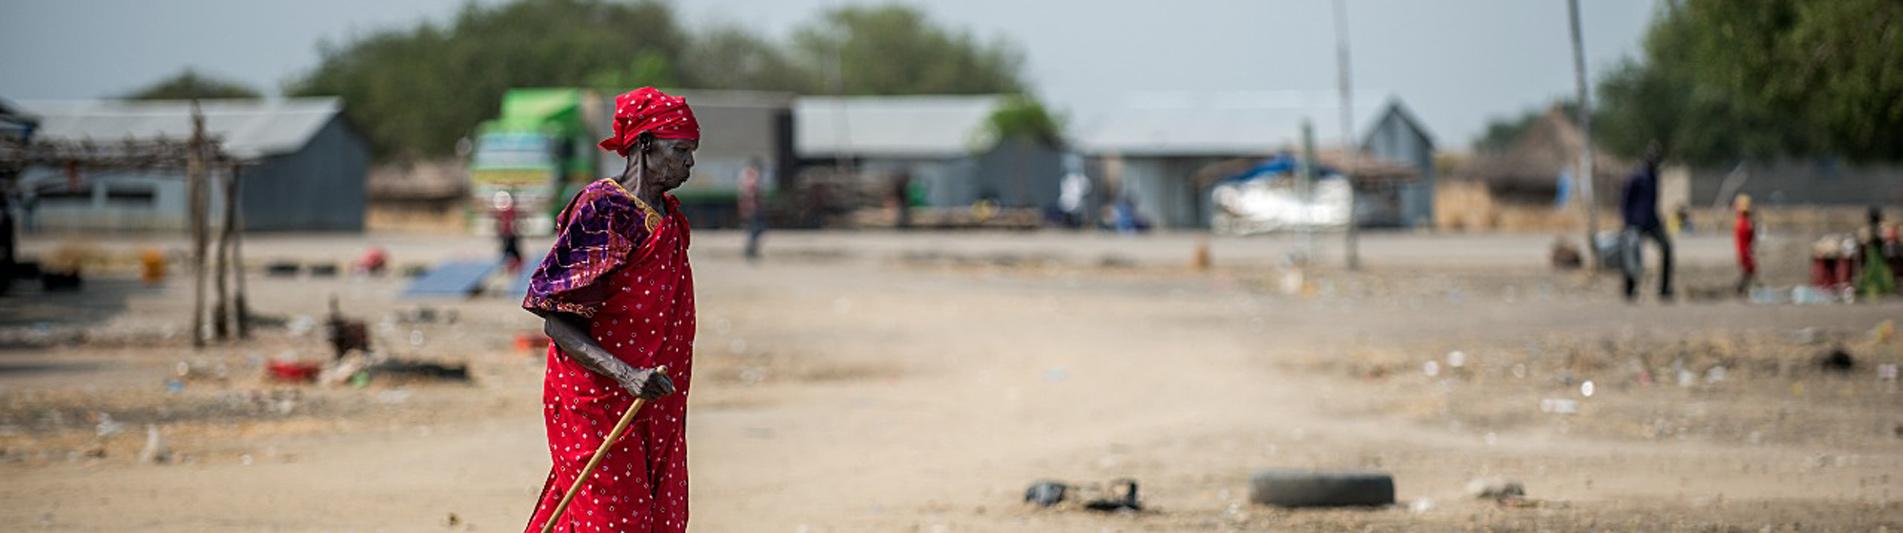 JAM TRIO CHOOSE SOUTH SUDAN